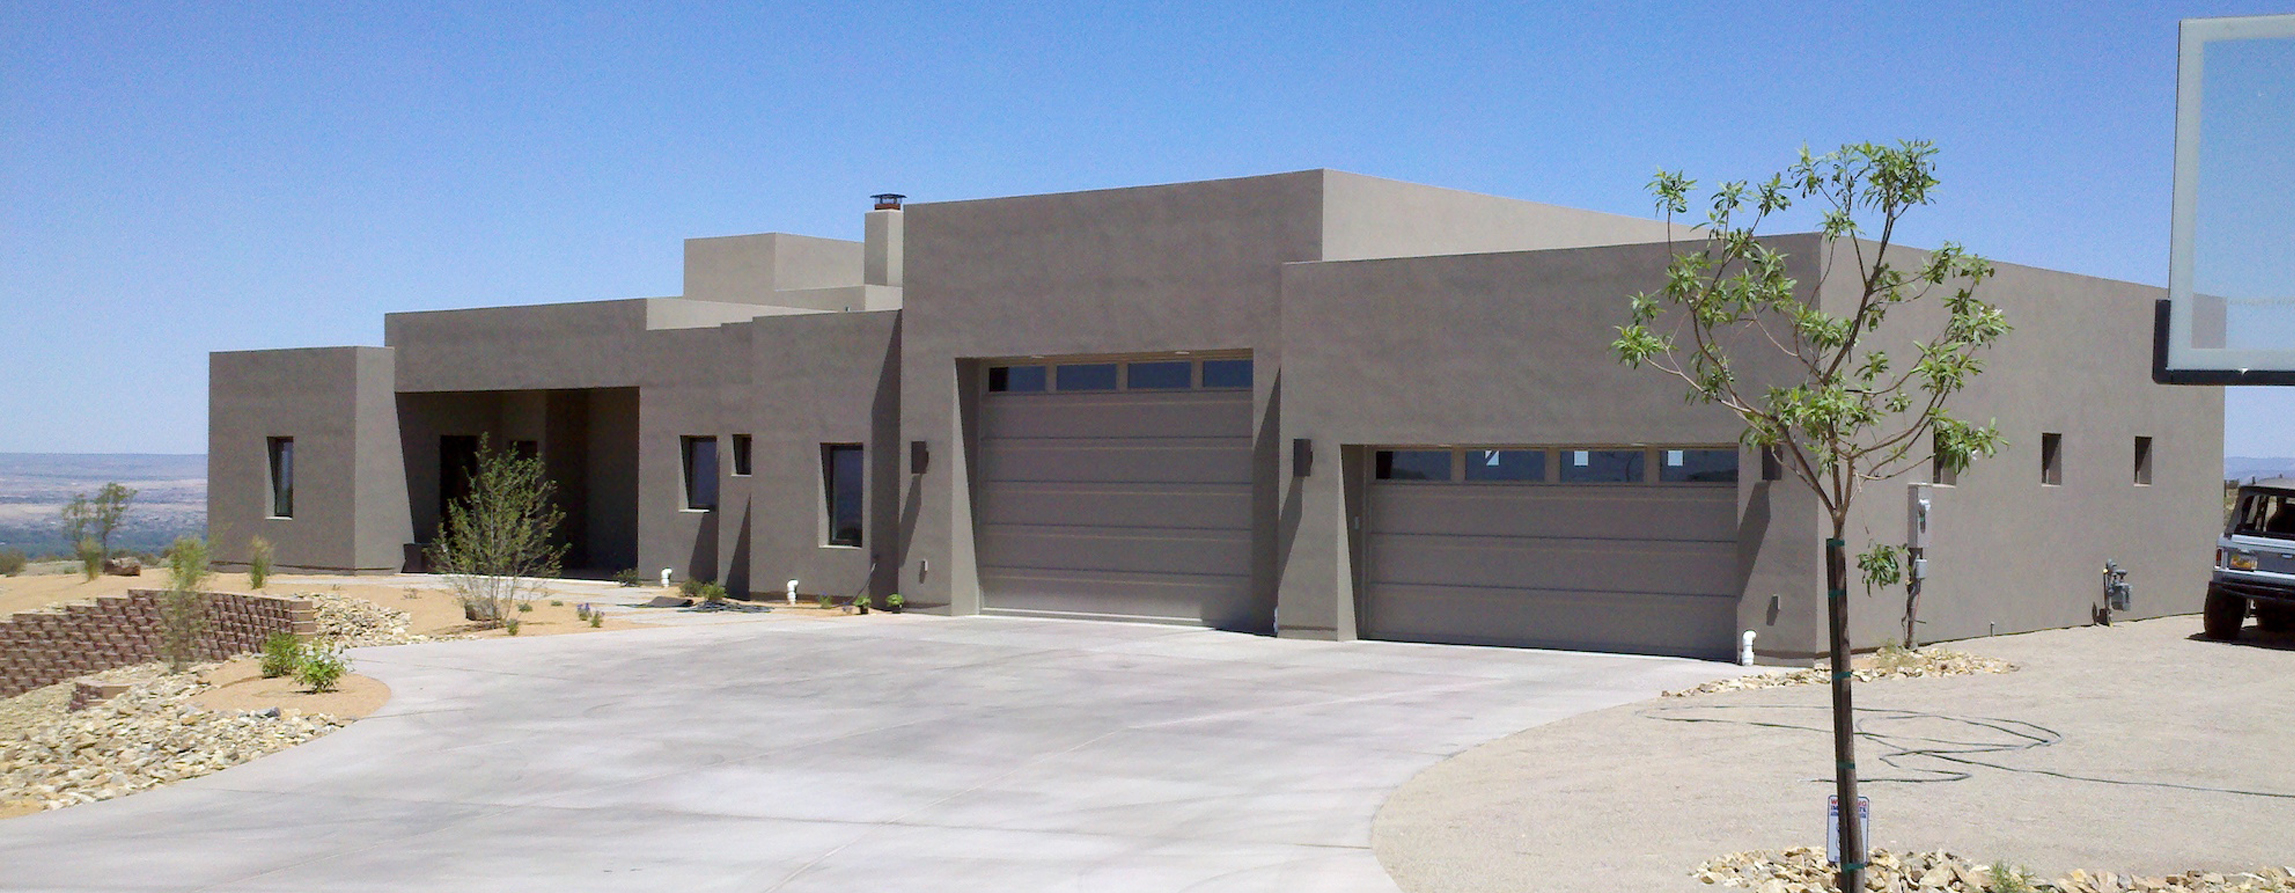 rv-garage-door-repair-havasu